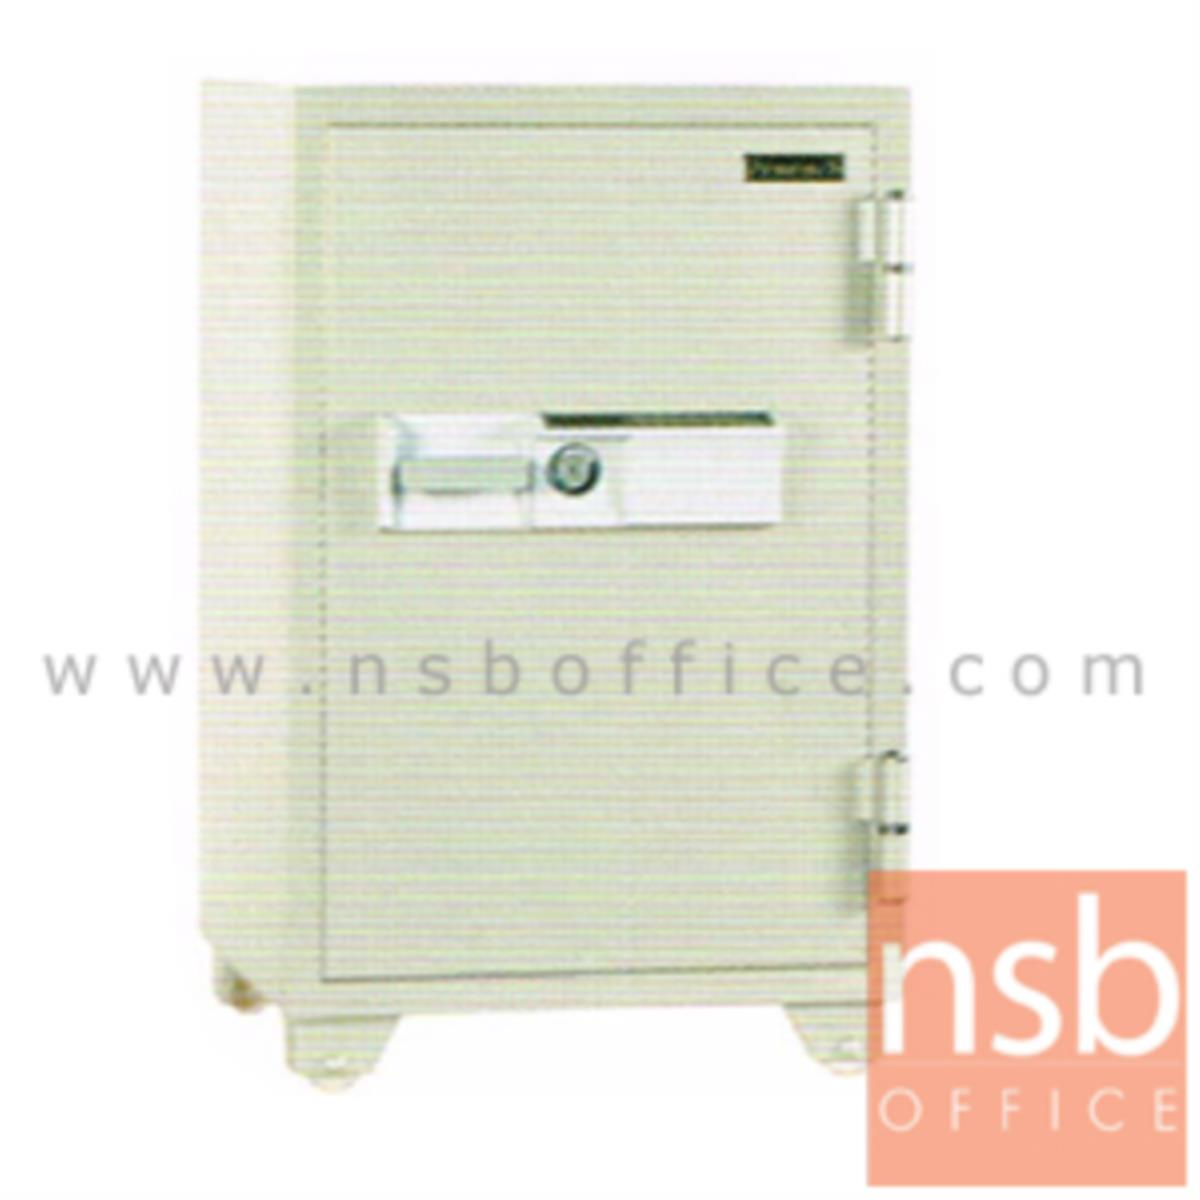 F05A058:ตู้เซฟดิจิตอล 190 กก.  รุ่น PRESIDENT-SB40D2  มี 1 กุญแจ 1 รหัส (รหัสใช้กดหน้าตู้)